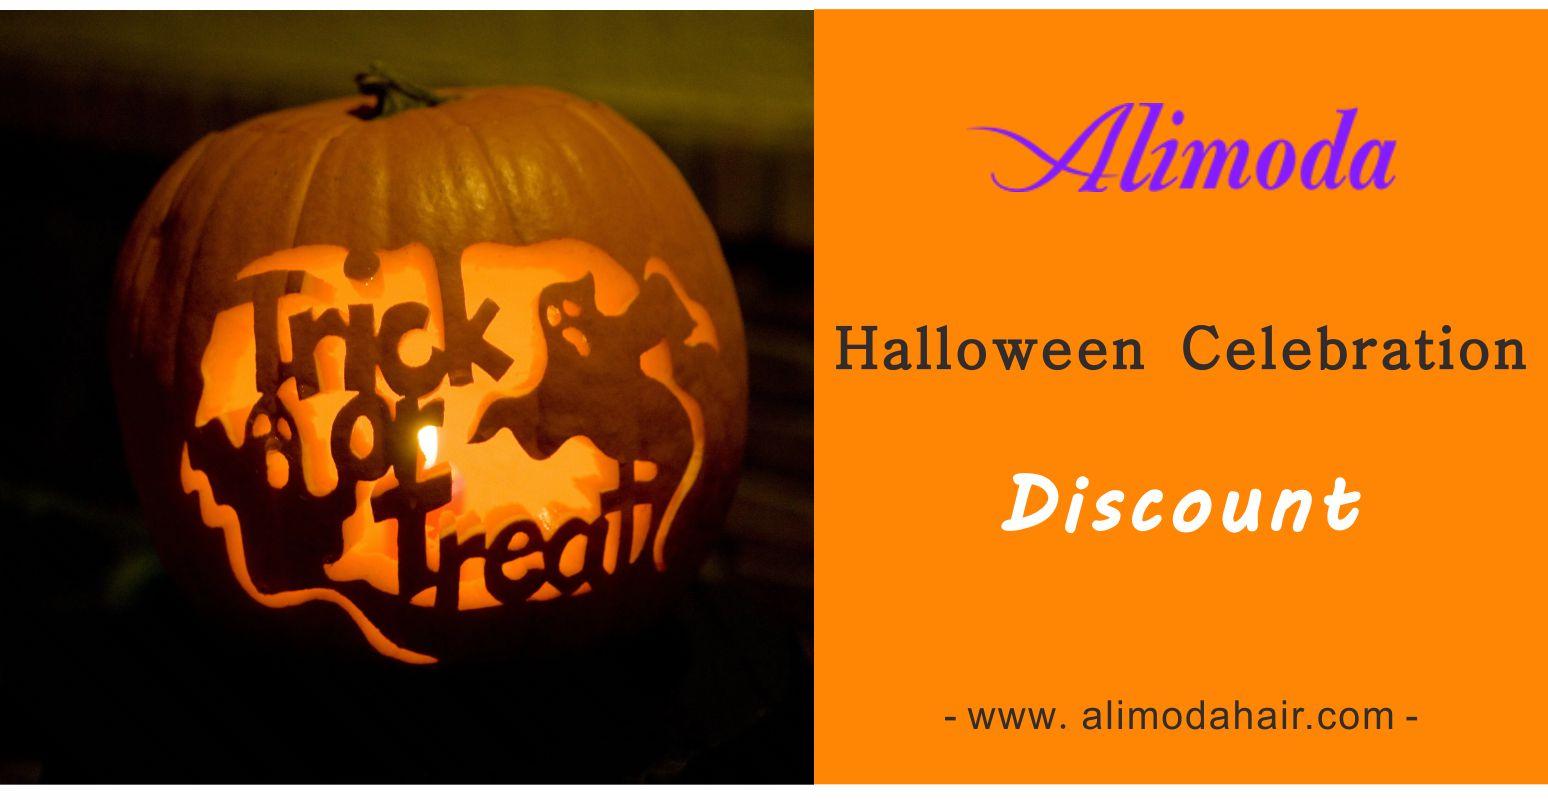 Alimoda Halloween Celebration Discount